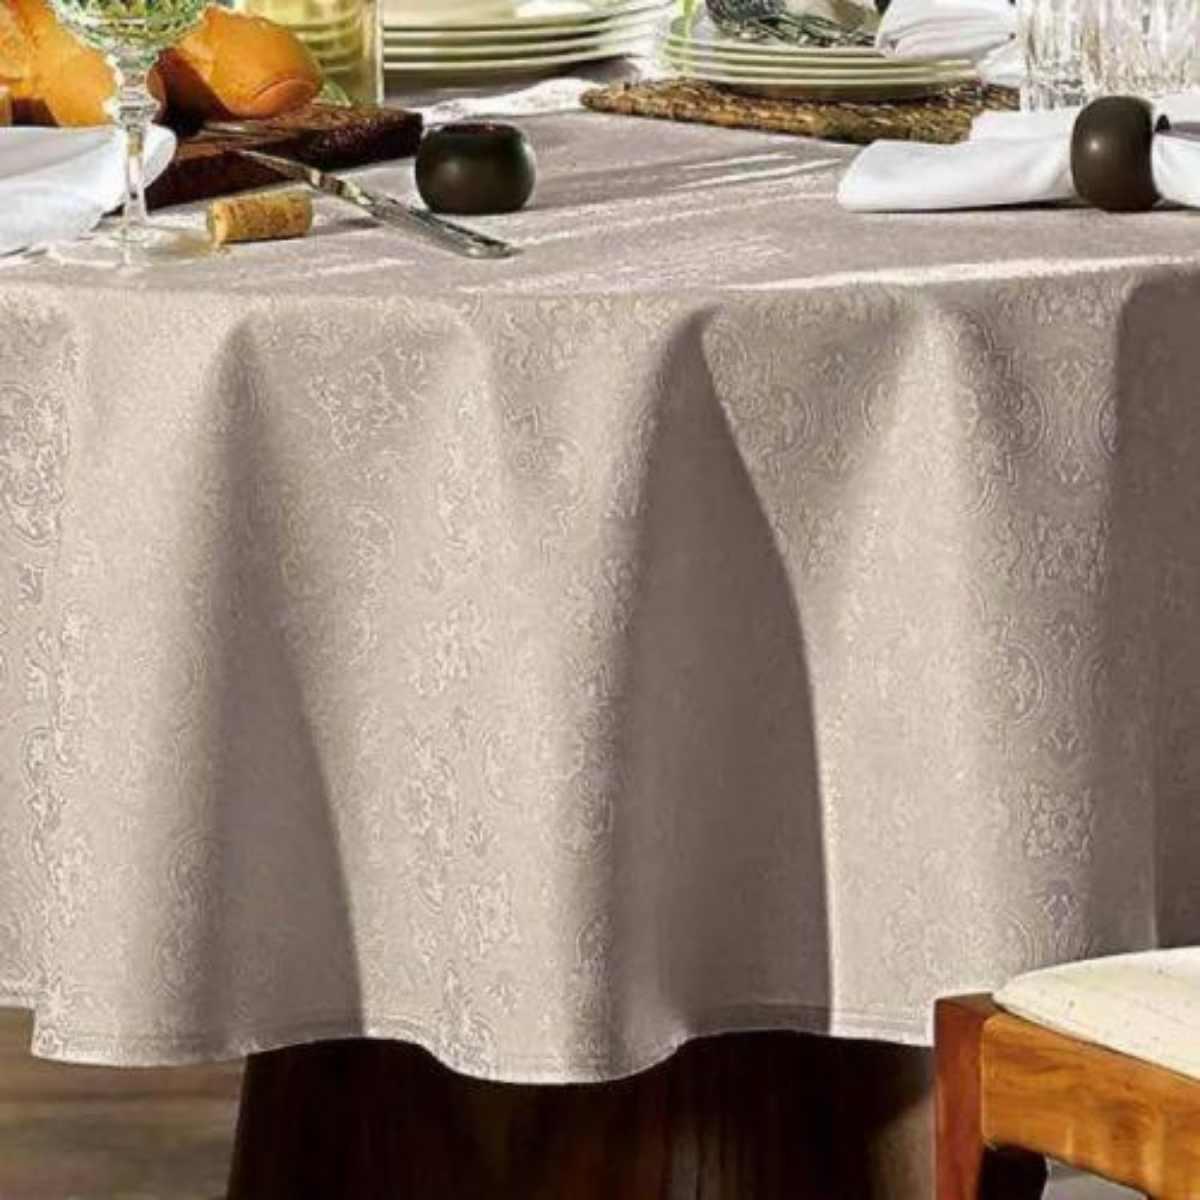 Toalha mesa sempre limpa jacquard  178rd Faenza Noz Moscada